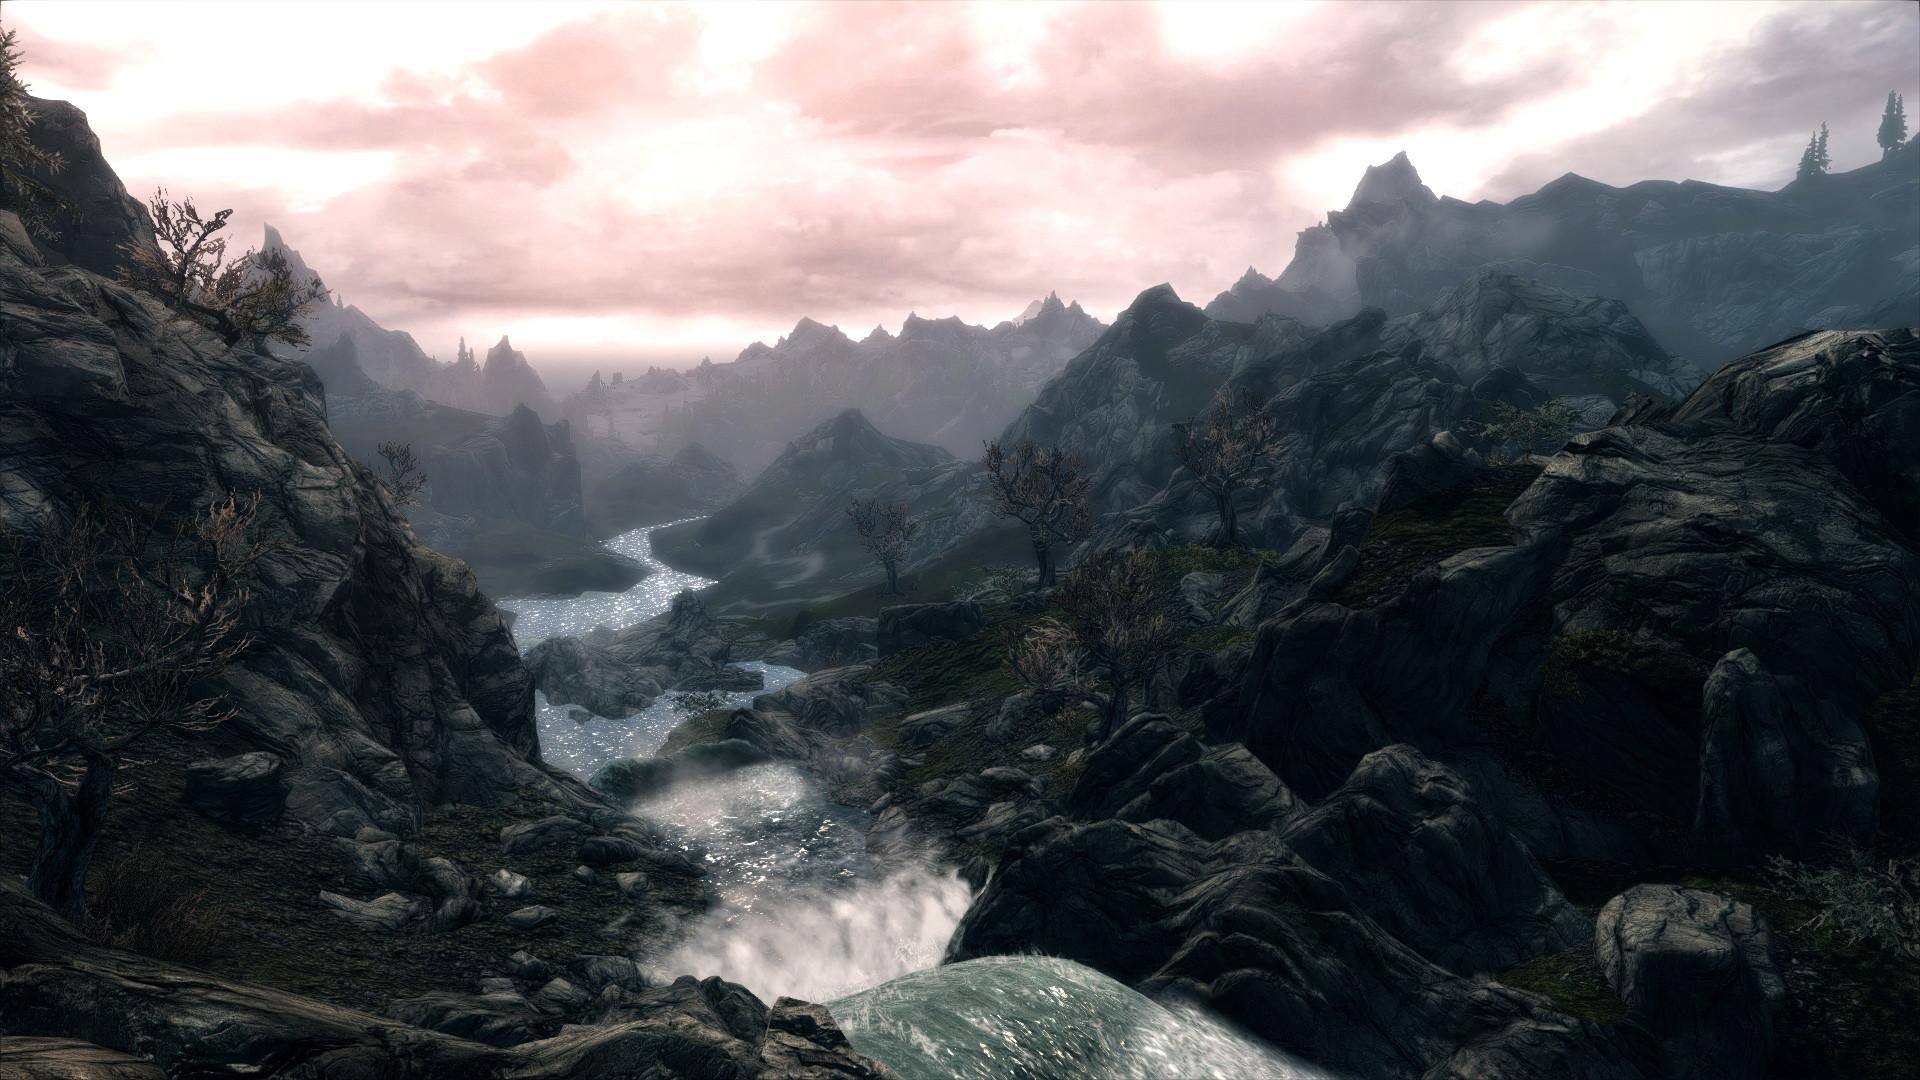 Skyrim Landscape Wallpaper #6888748